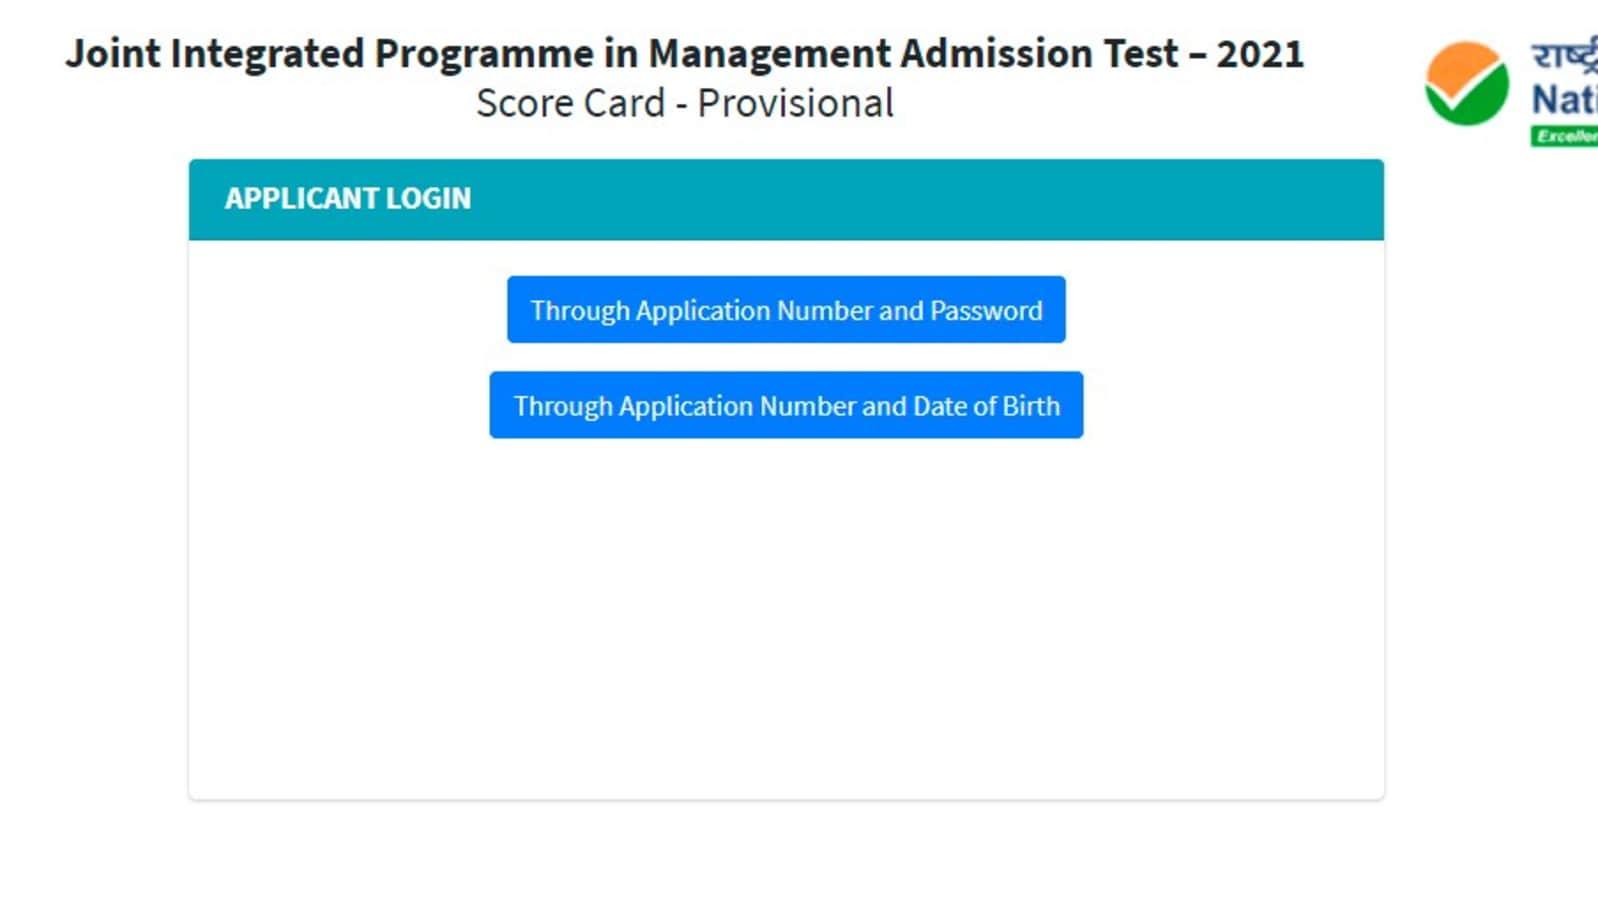 JIPMAT 2021 results declared, check score card at jipmat.nta.ac.in